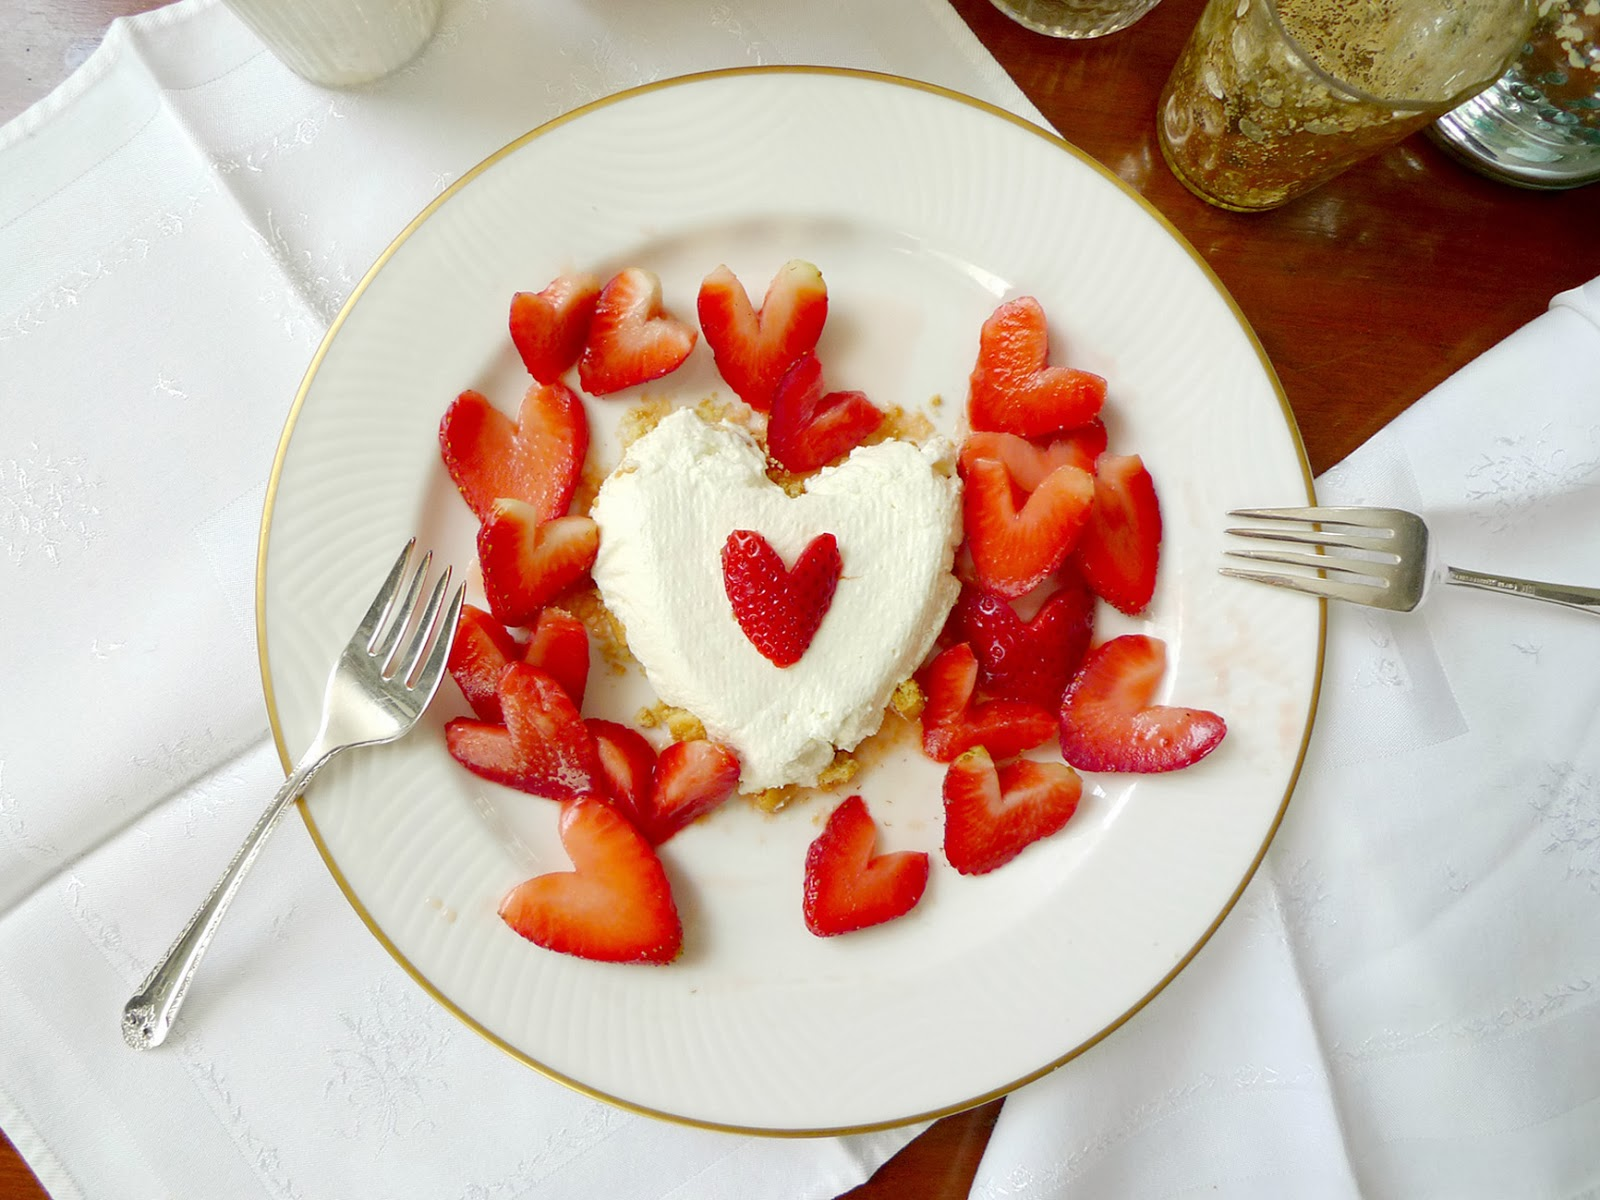 Intelliblog: FOOD FRIDAY - CREAMY HEARTS